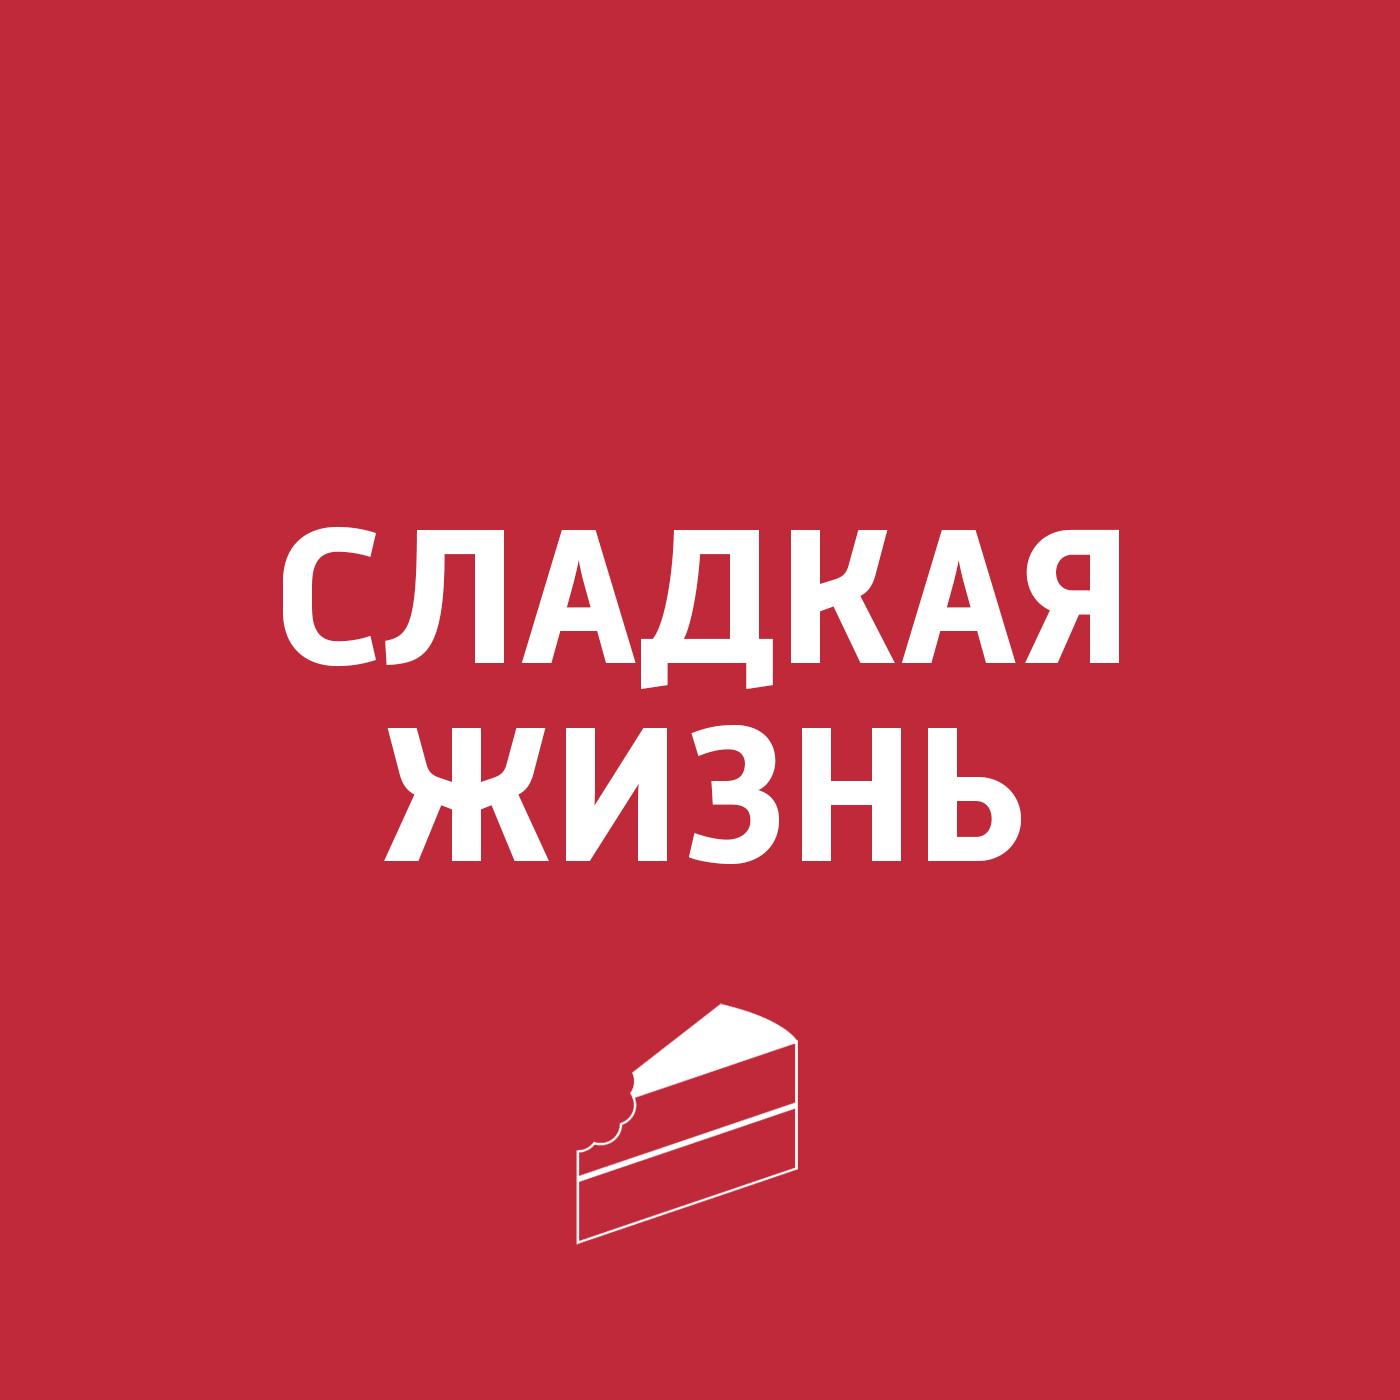 Картаев Павел Панна Кота десерт laime панна котта 2 шт по 100 г